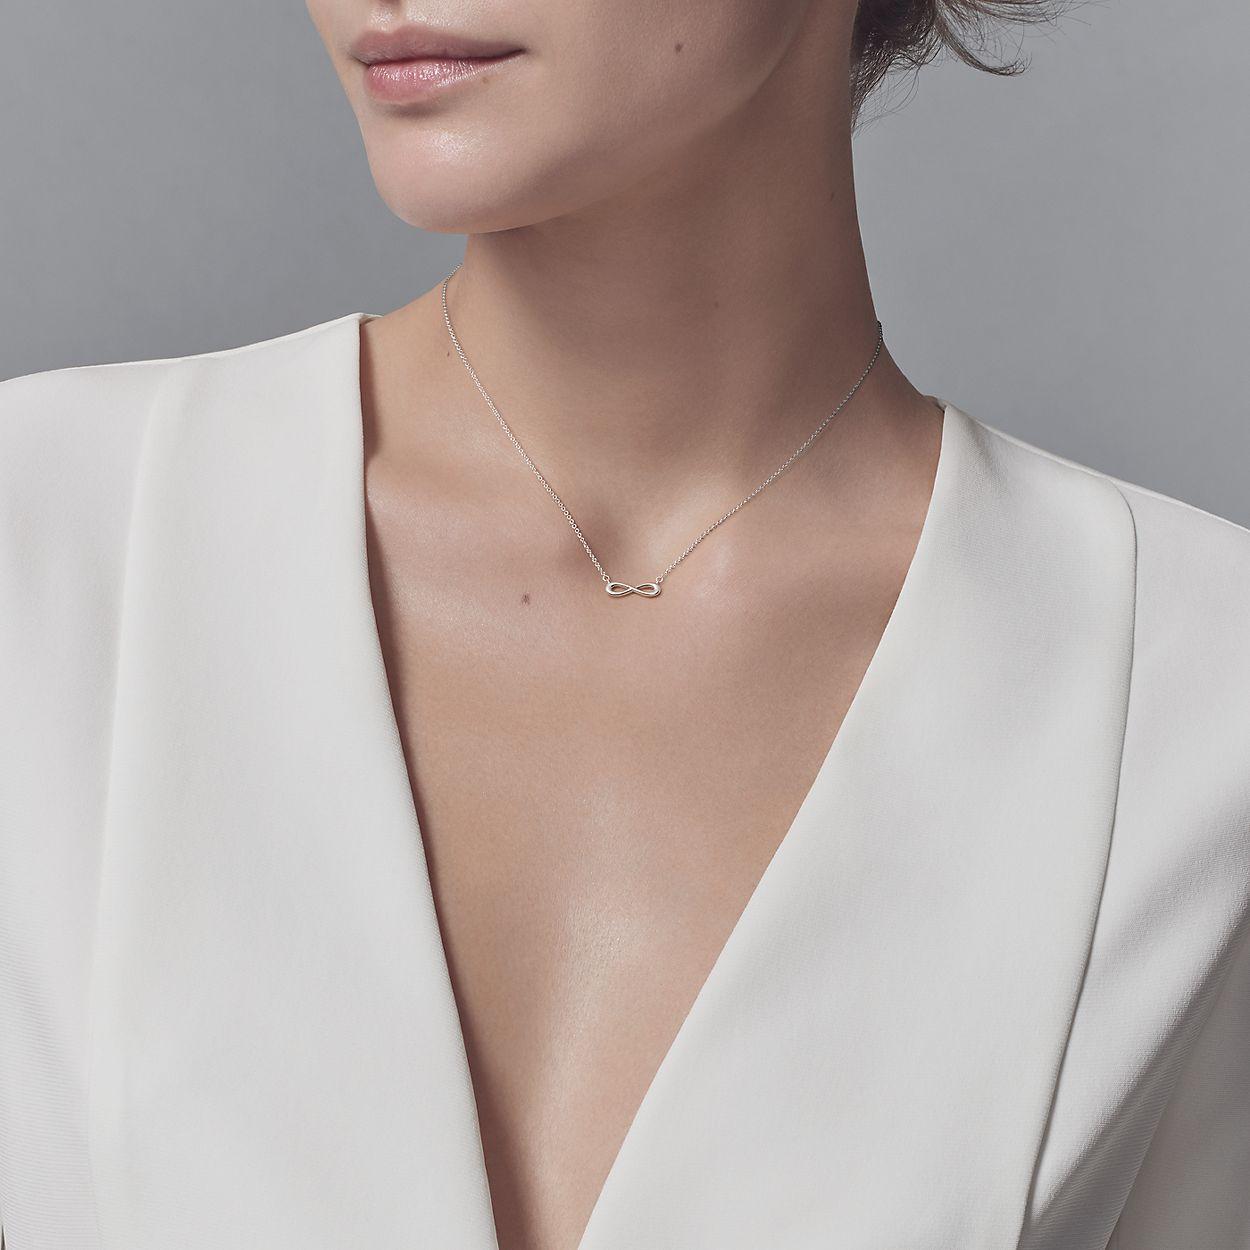 502decf4f Tiffany Infinity pendant in sterling silver, mini. | Tiffany & Co.